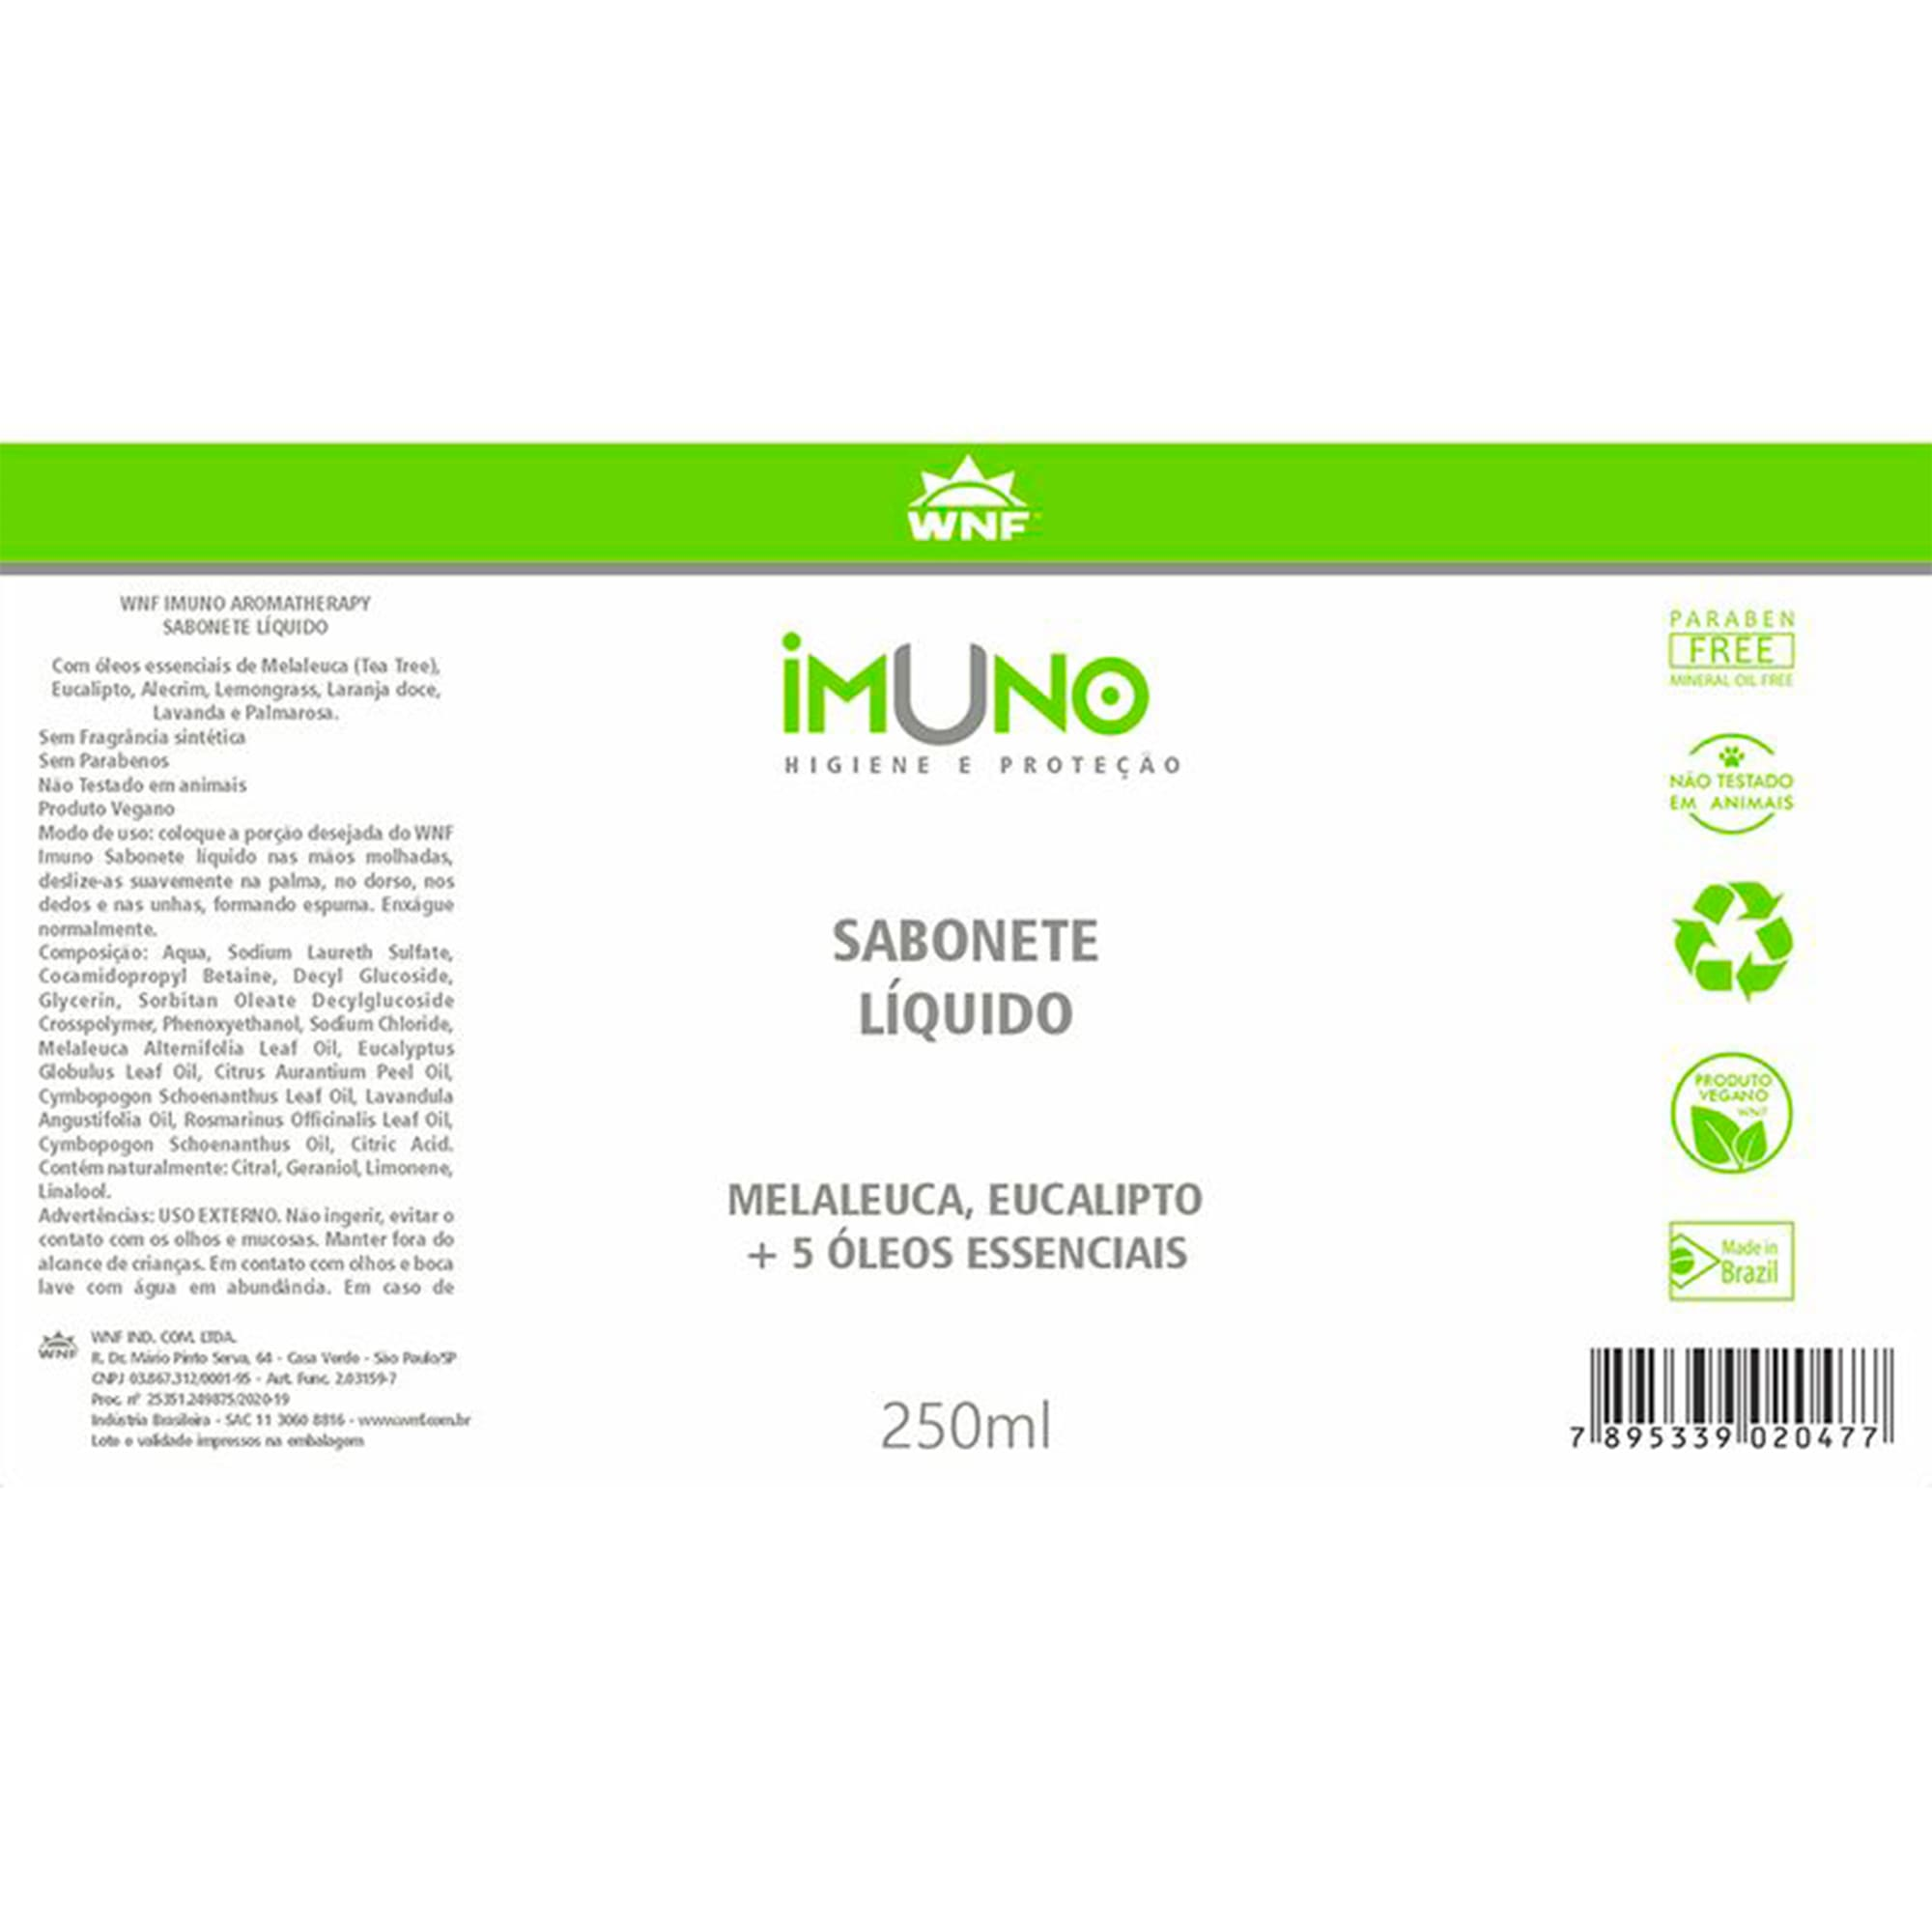 Sabonete Líquido Imuno 250ml - WNF